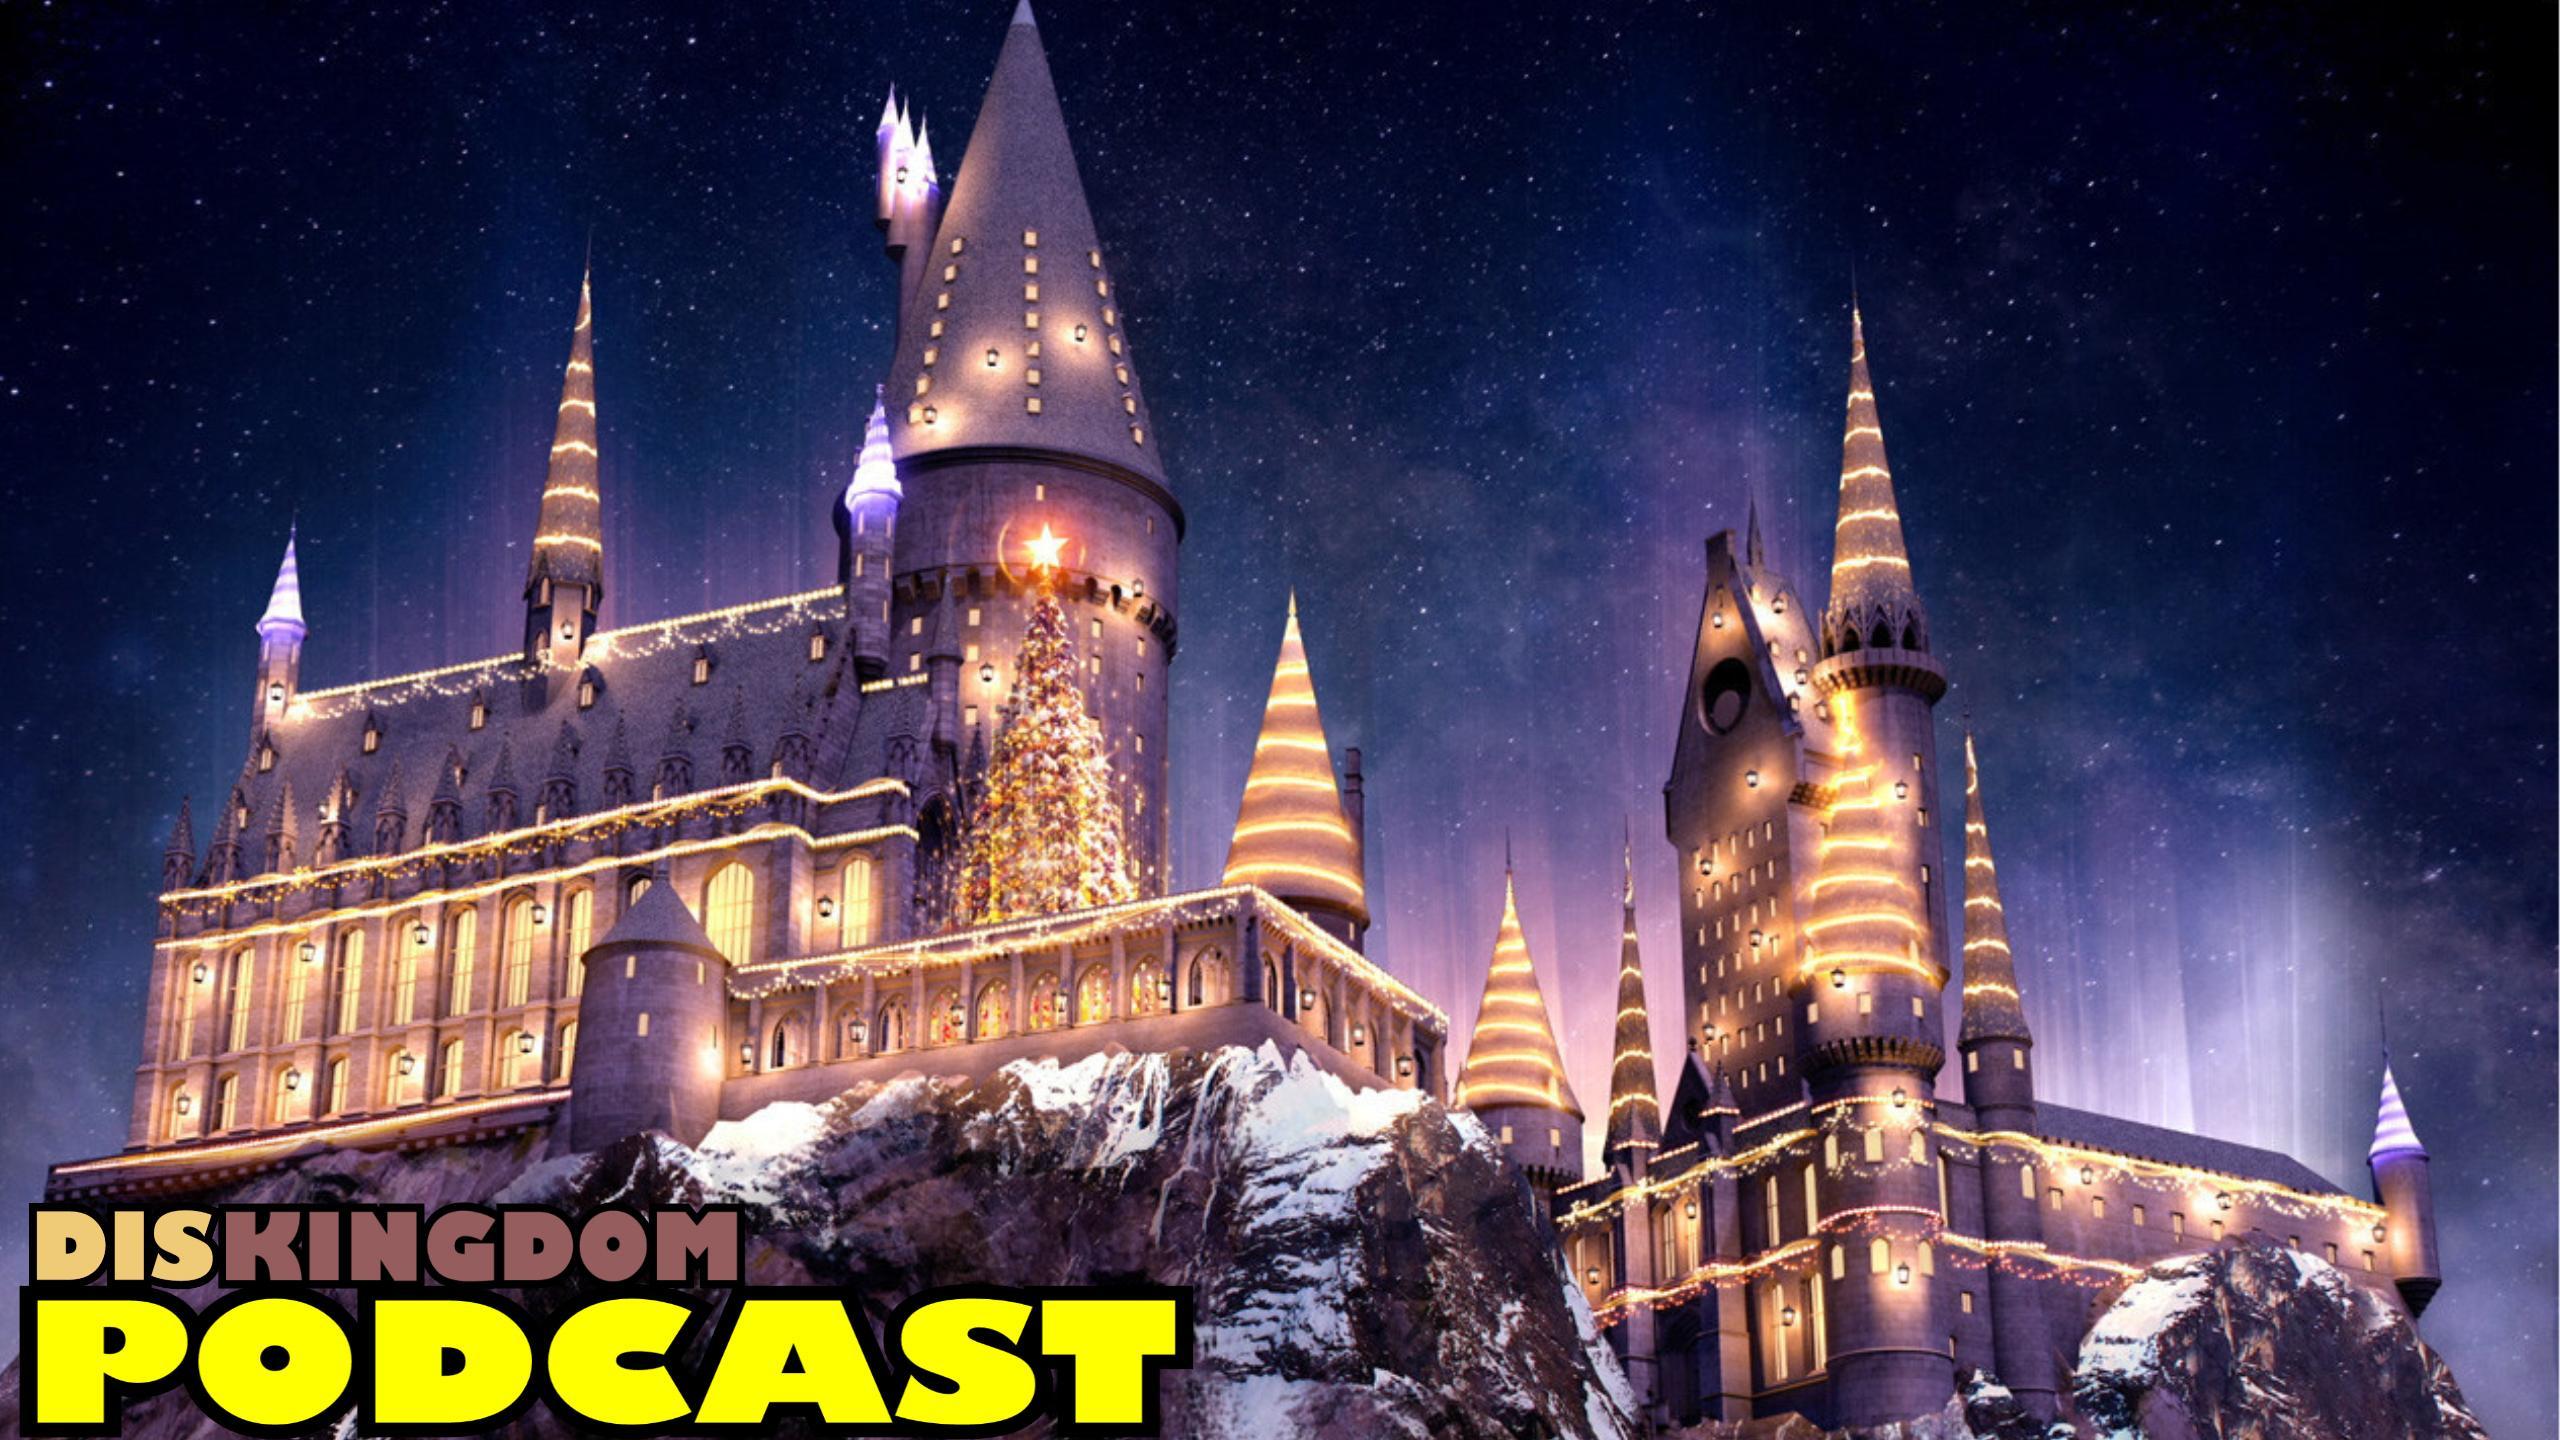 Universal Studios Christmas.New Harry Potter Christmas Activities Coming To Universal